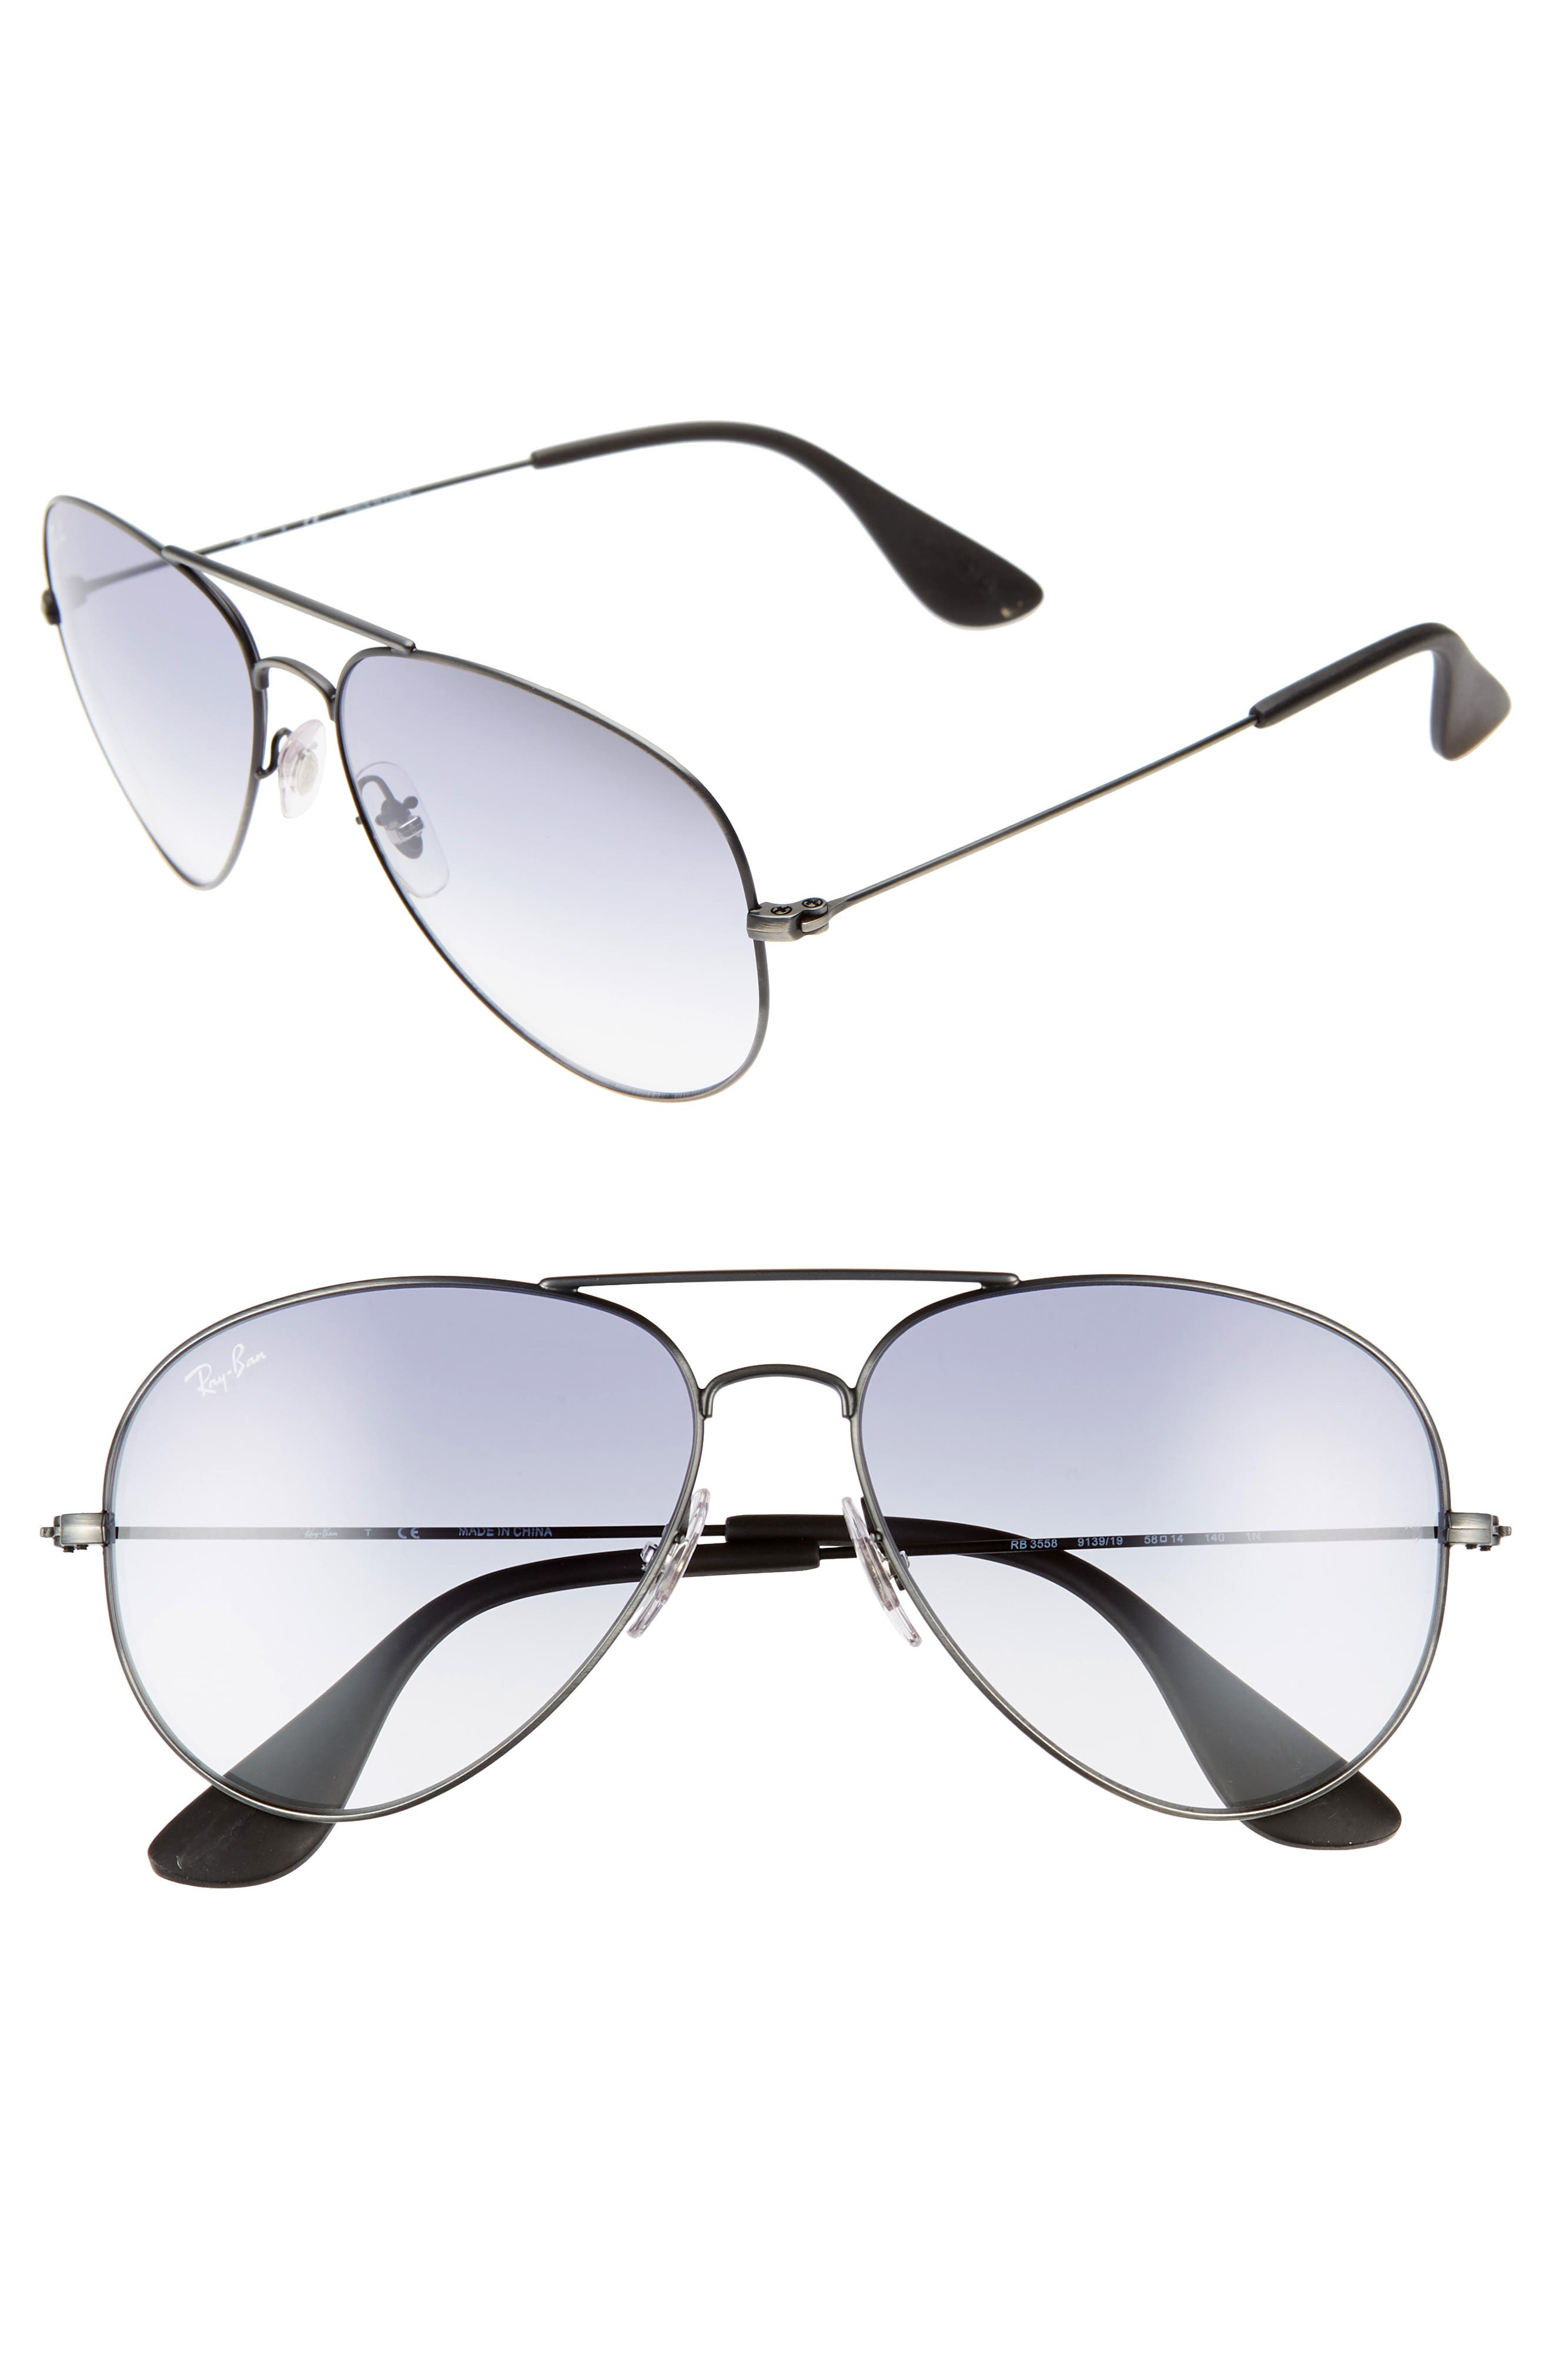 Ray-Ban Pilot 5m Gradient Sunglasses - Light Blue